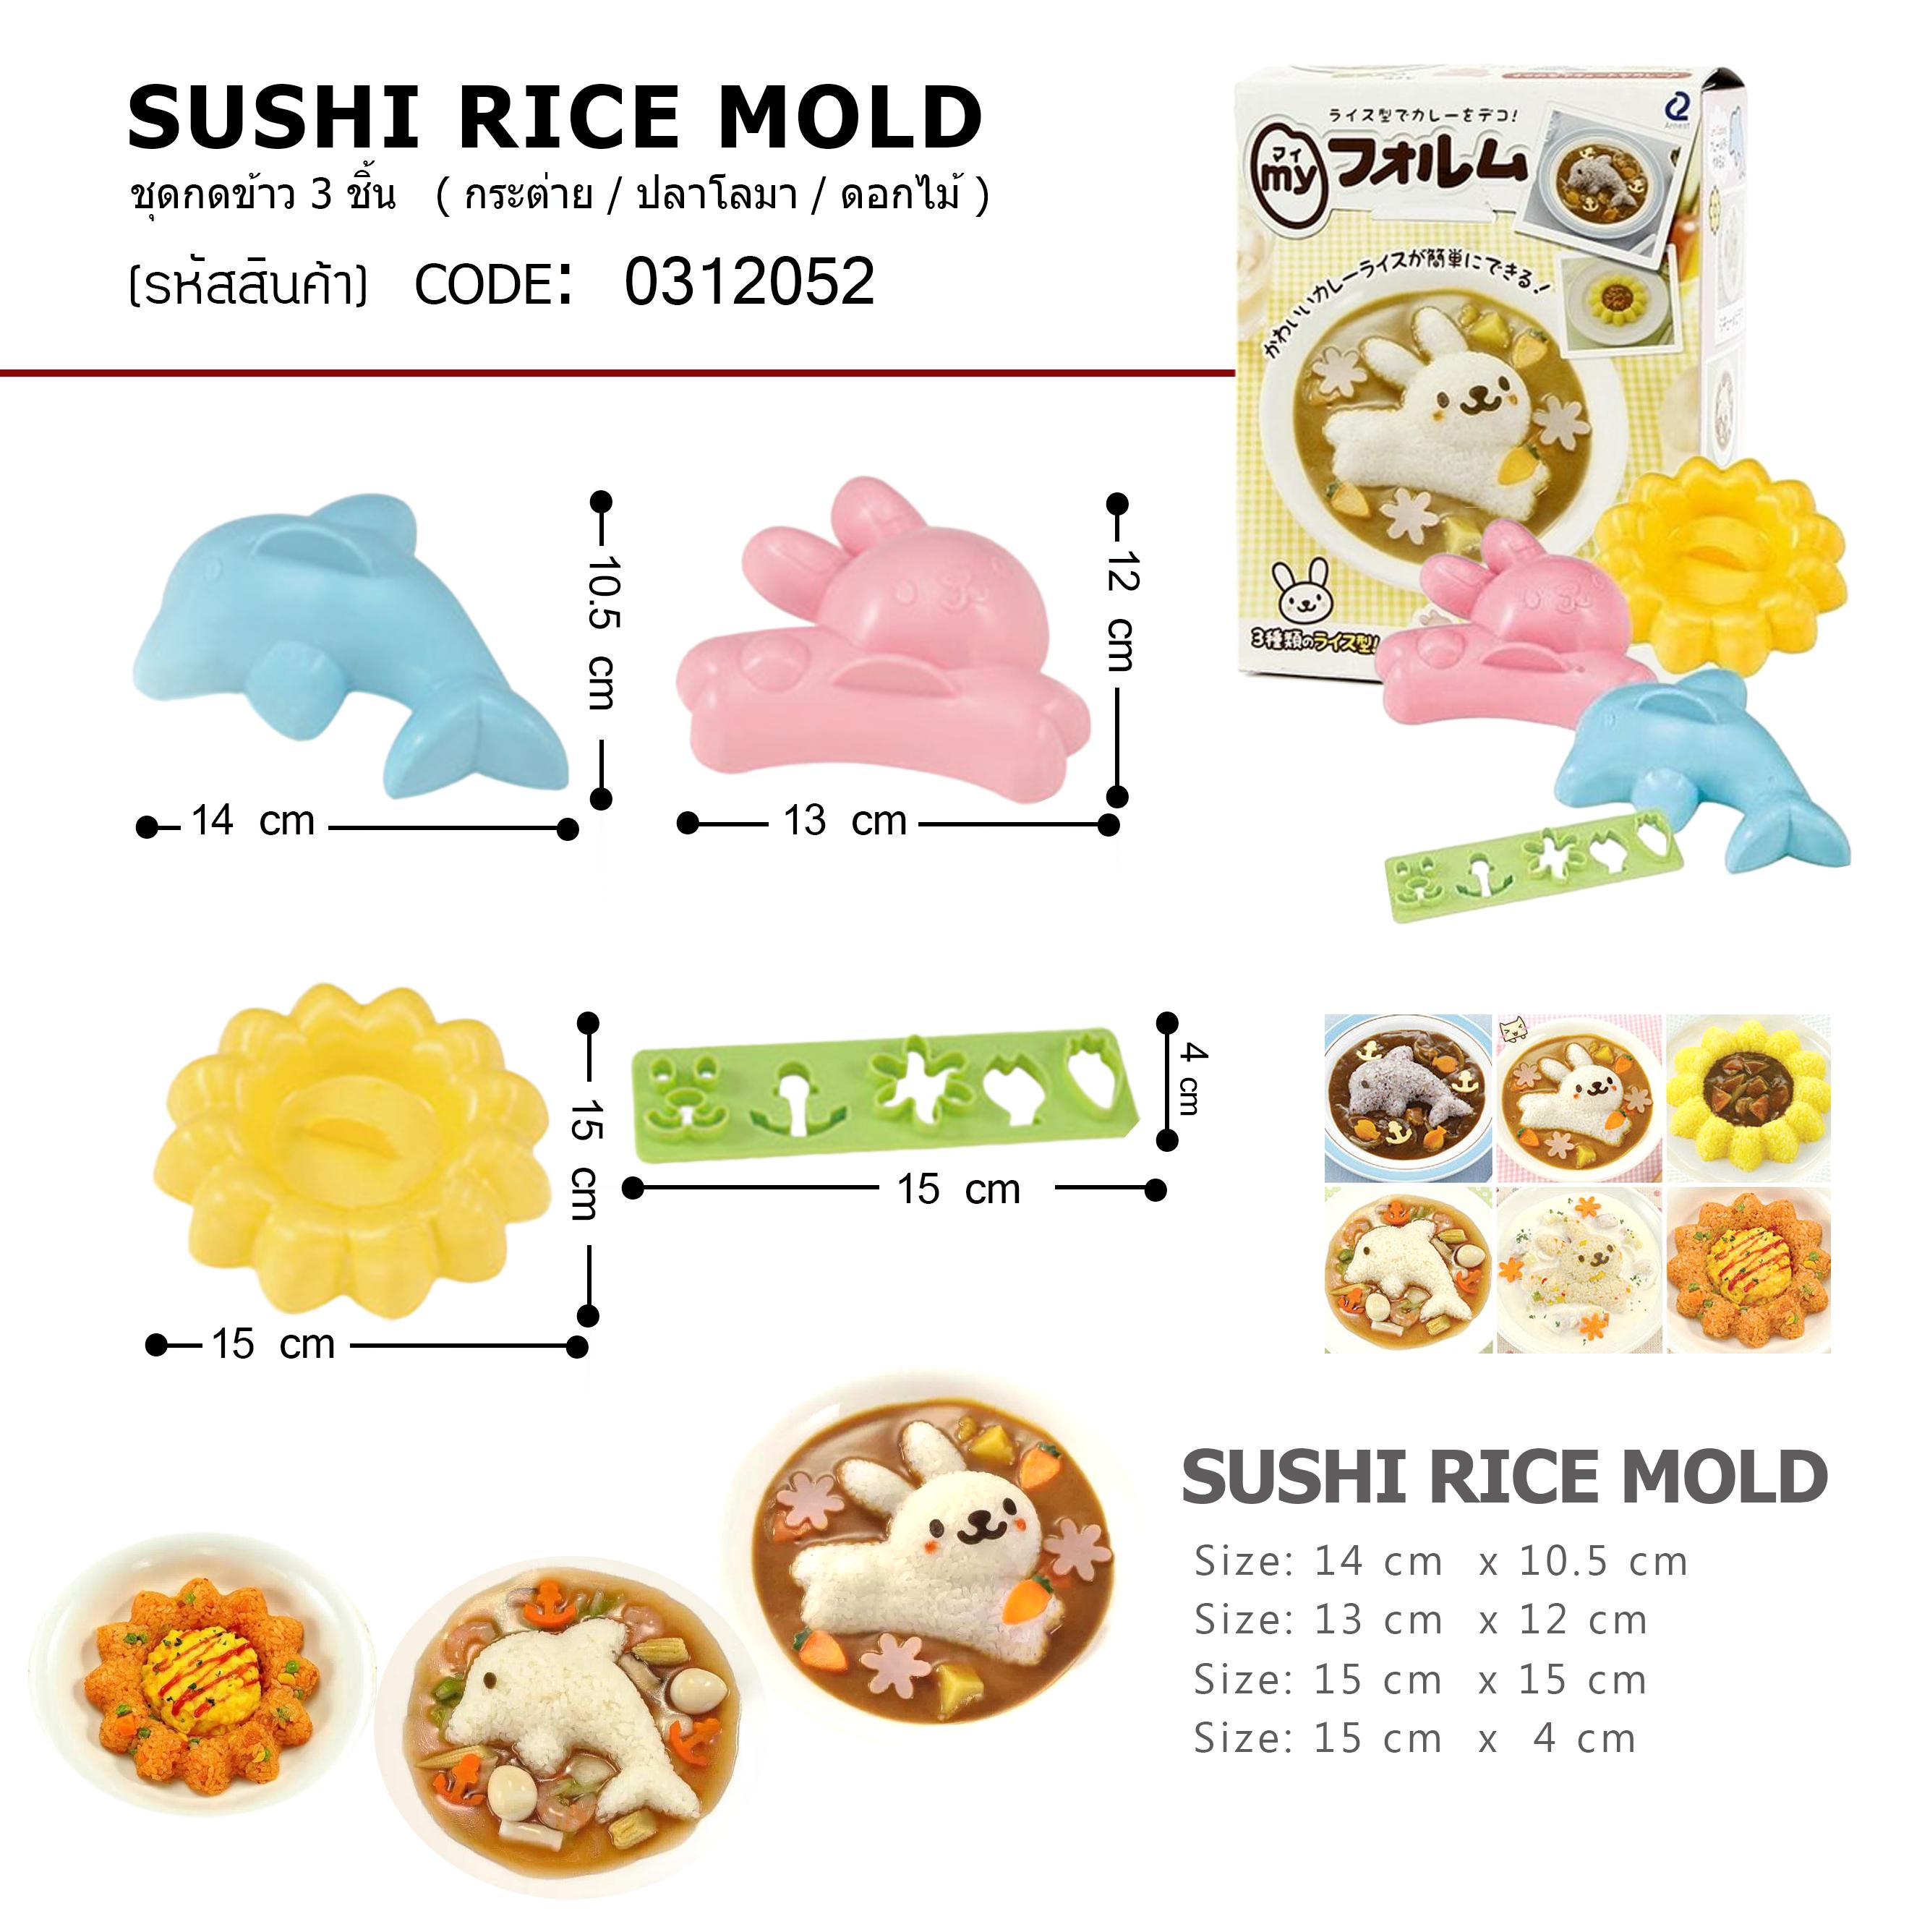 Sushi rice mold (ชุดพิมพ์กดข้าว กระต่าย/ปลาโลมา/ดอกไม้) TC0111